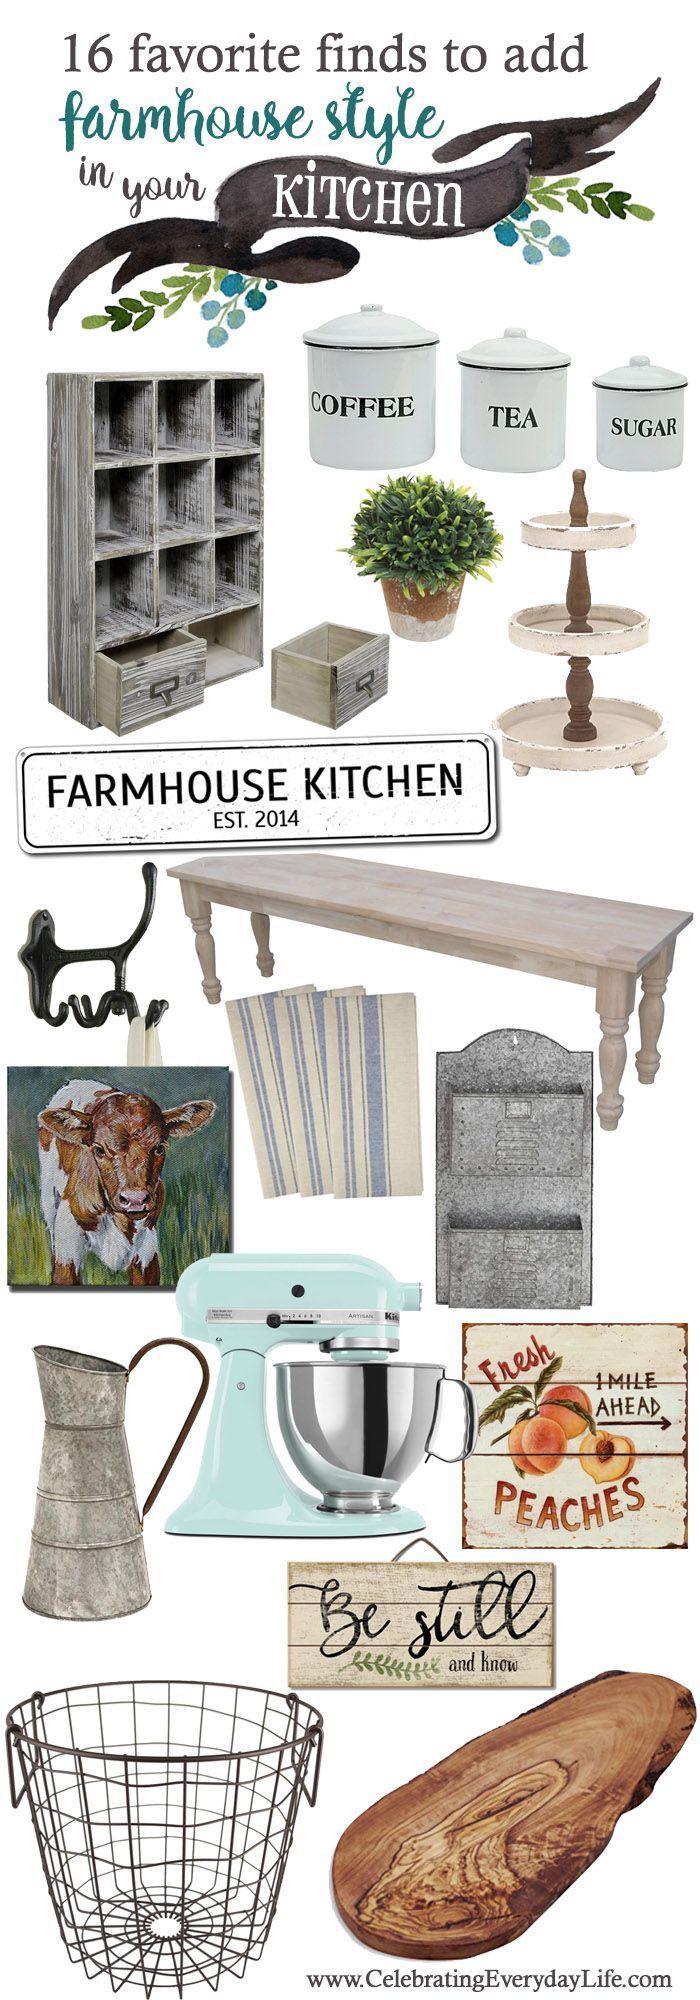 Favorite Farmhouse Kitchen Finds | Celebrating Everyday Life with Jennifer Carroll | http://www.CelebratingEverydayLife.com